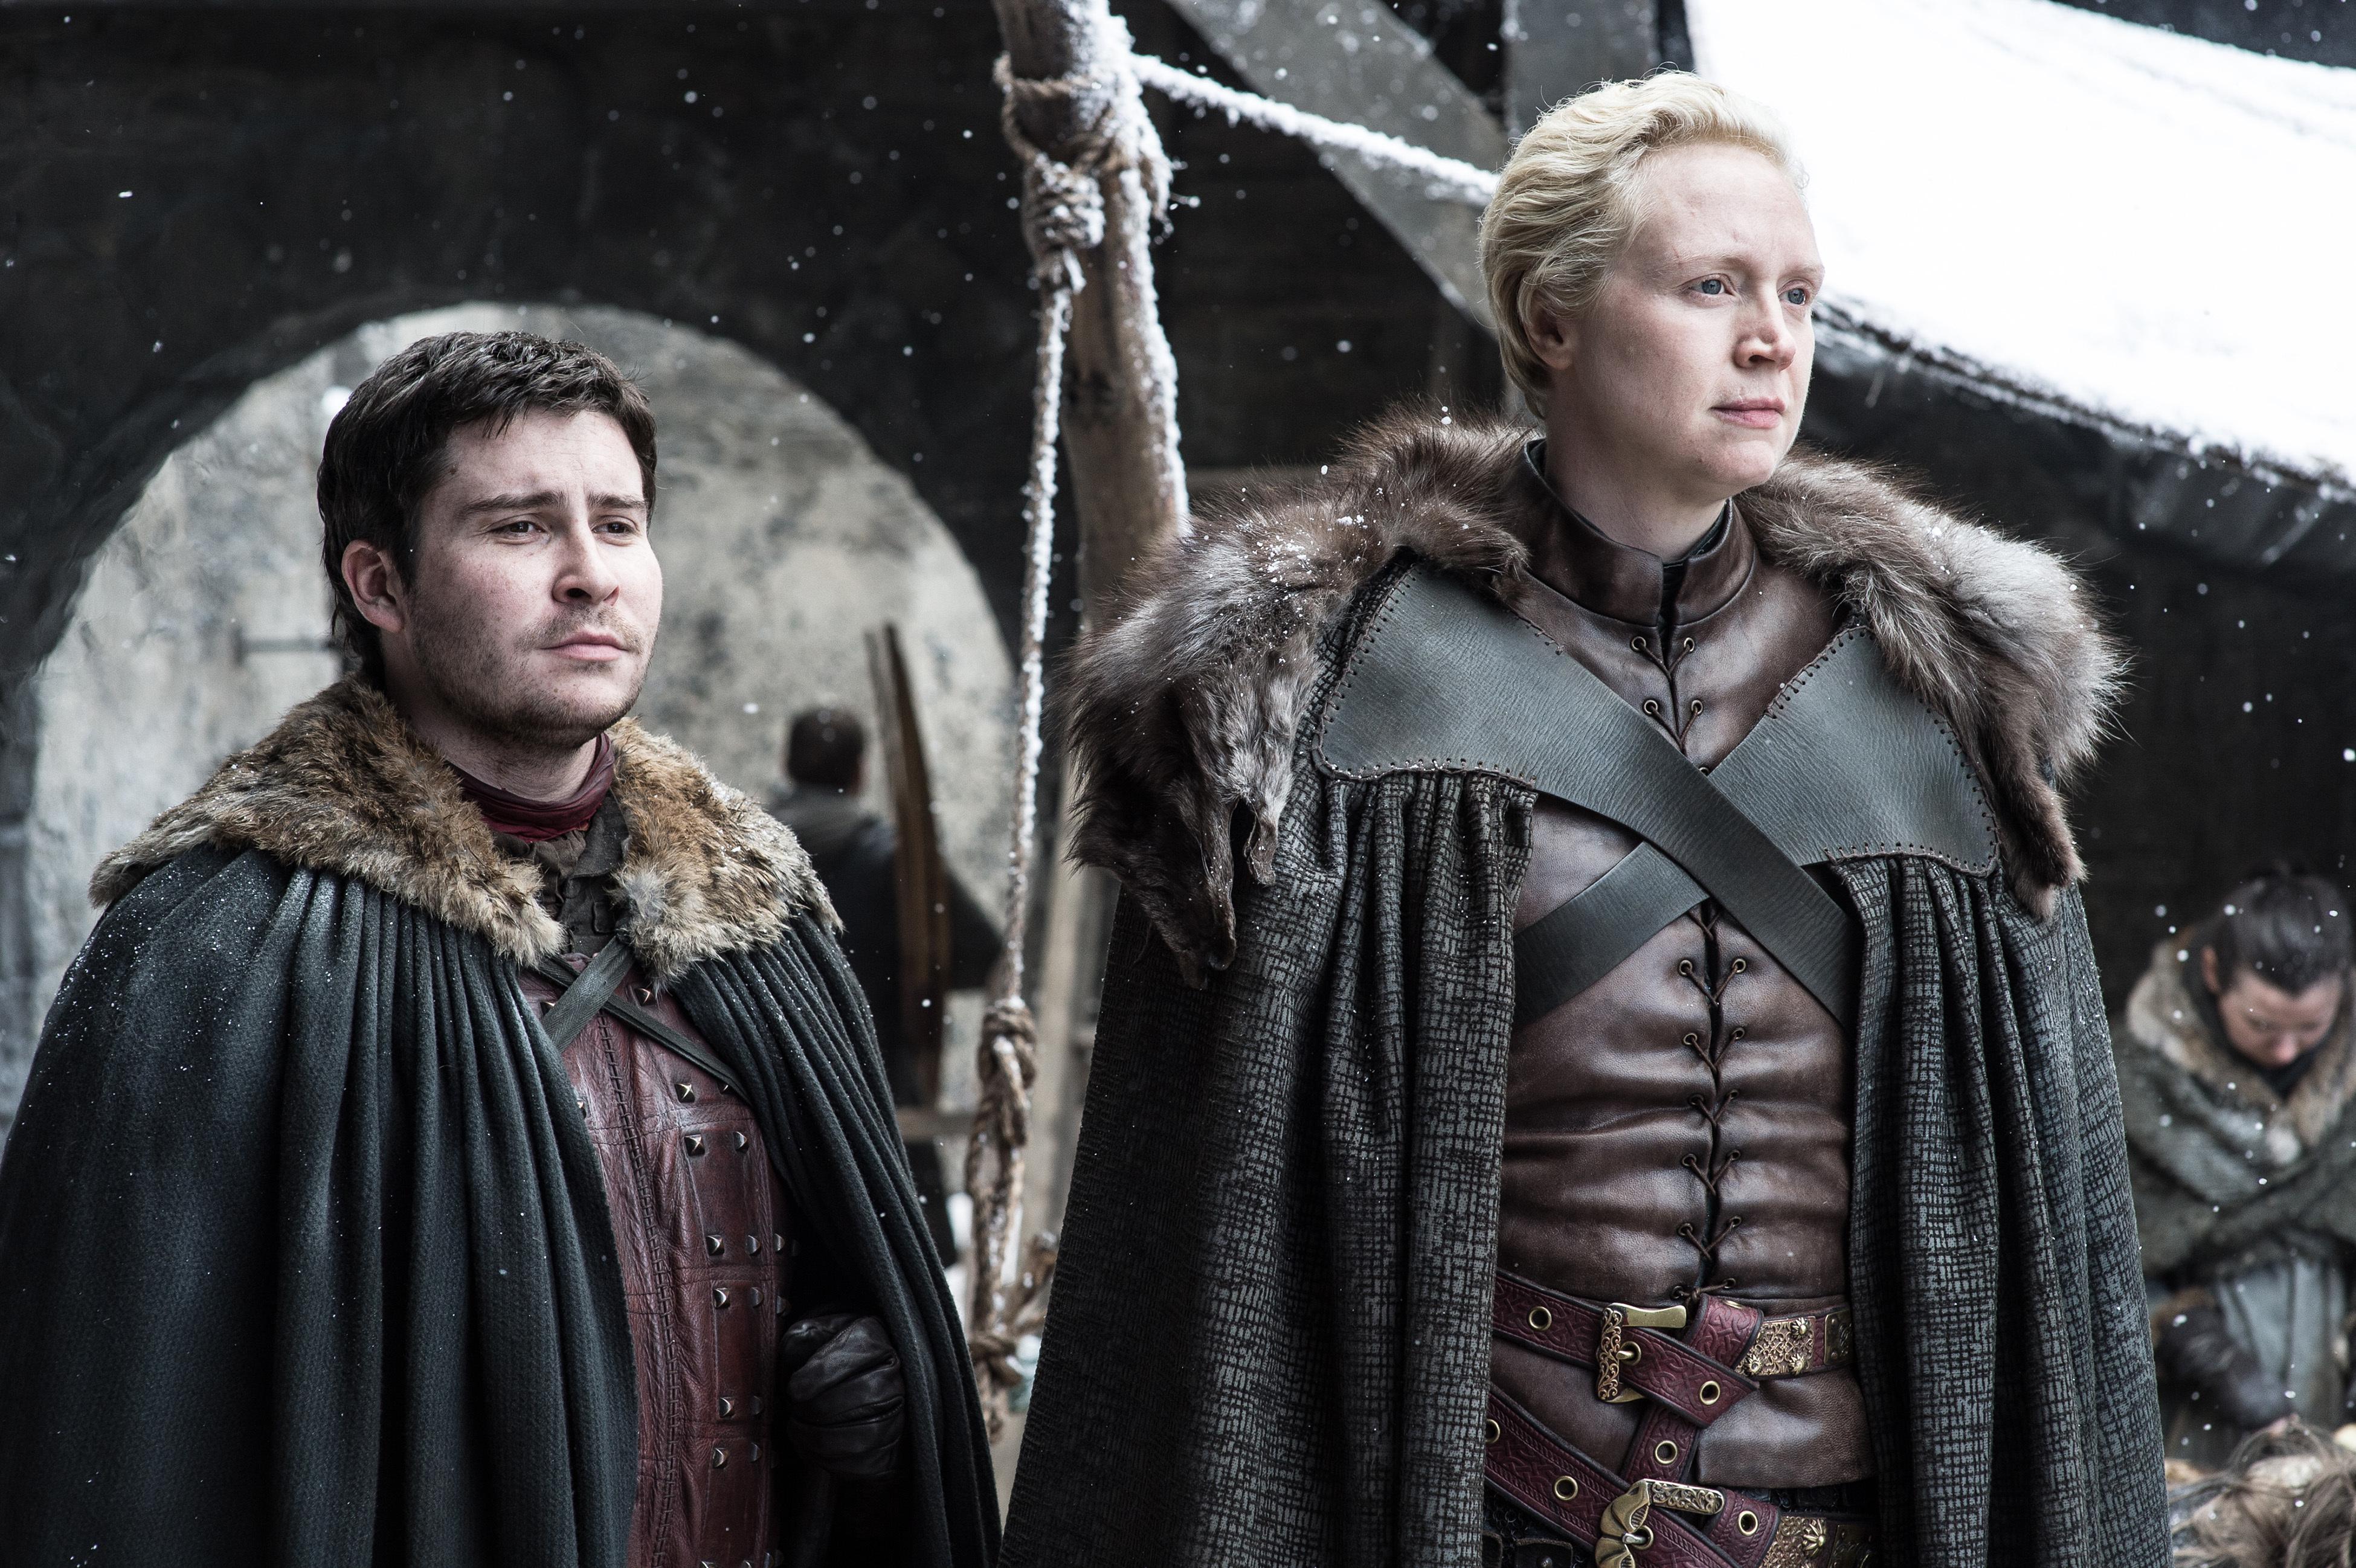 Podrick-Brienne-Spoils-of-War